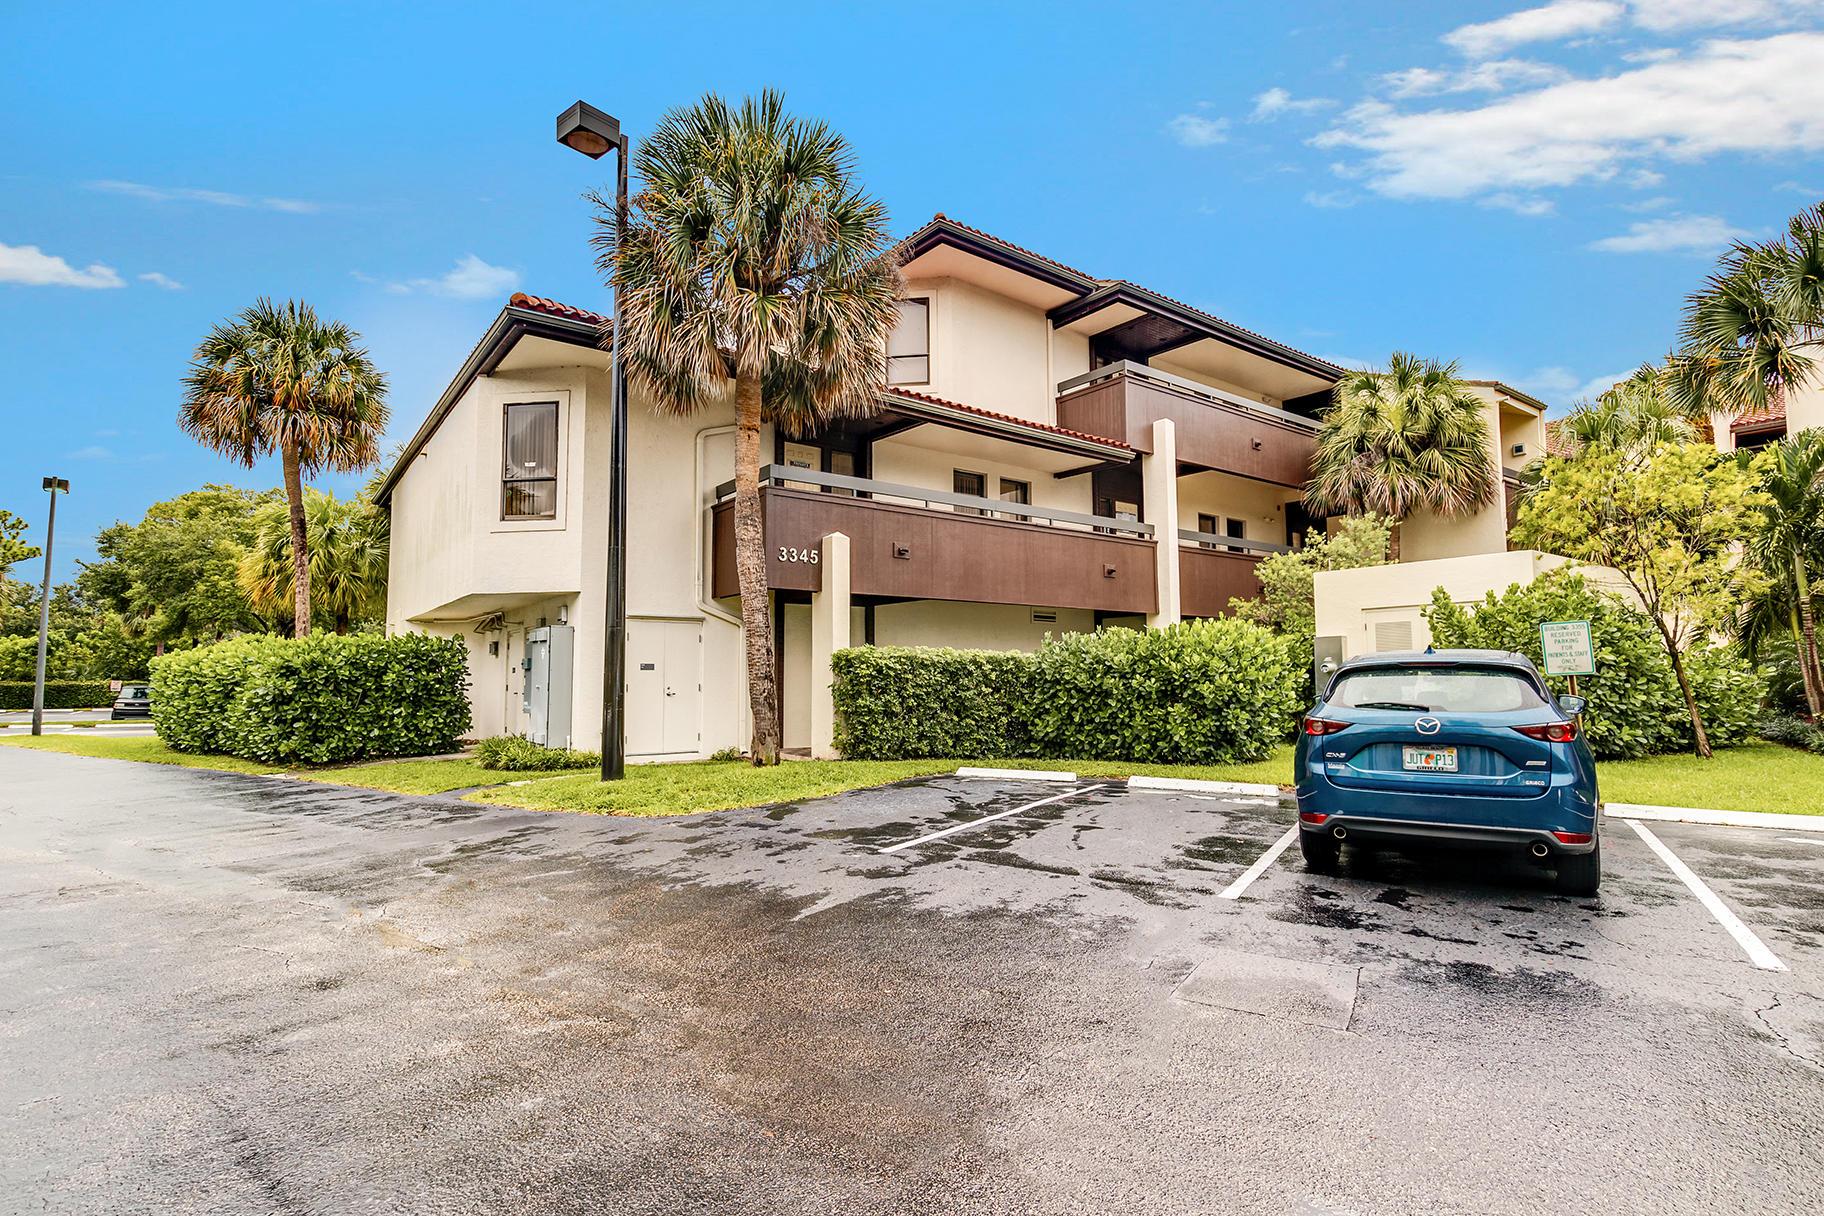 3345 Burns Unit 201, Palm Beach Gardens, Florida 33410